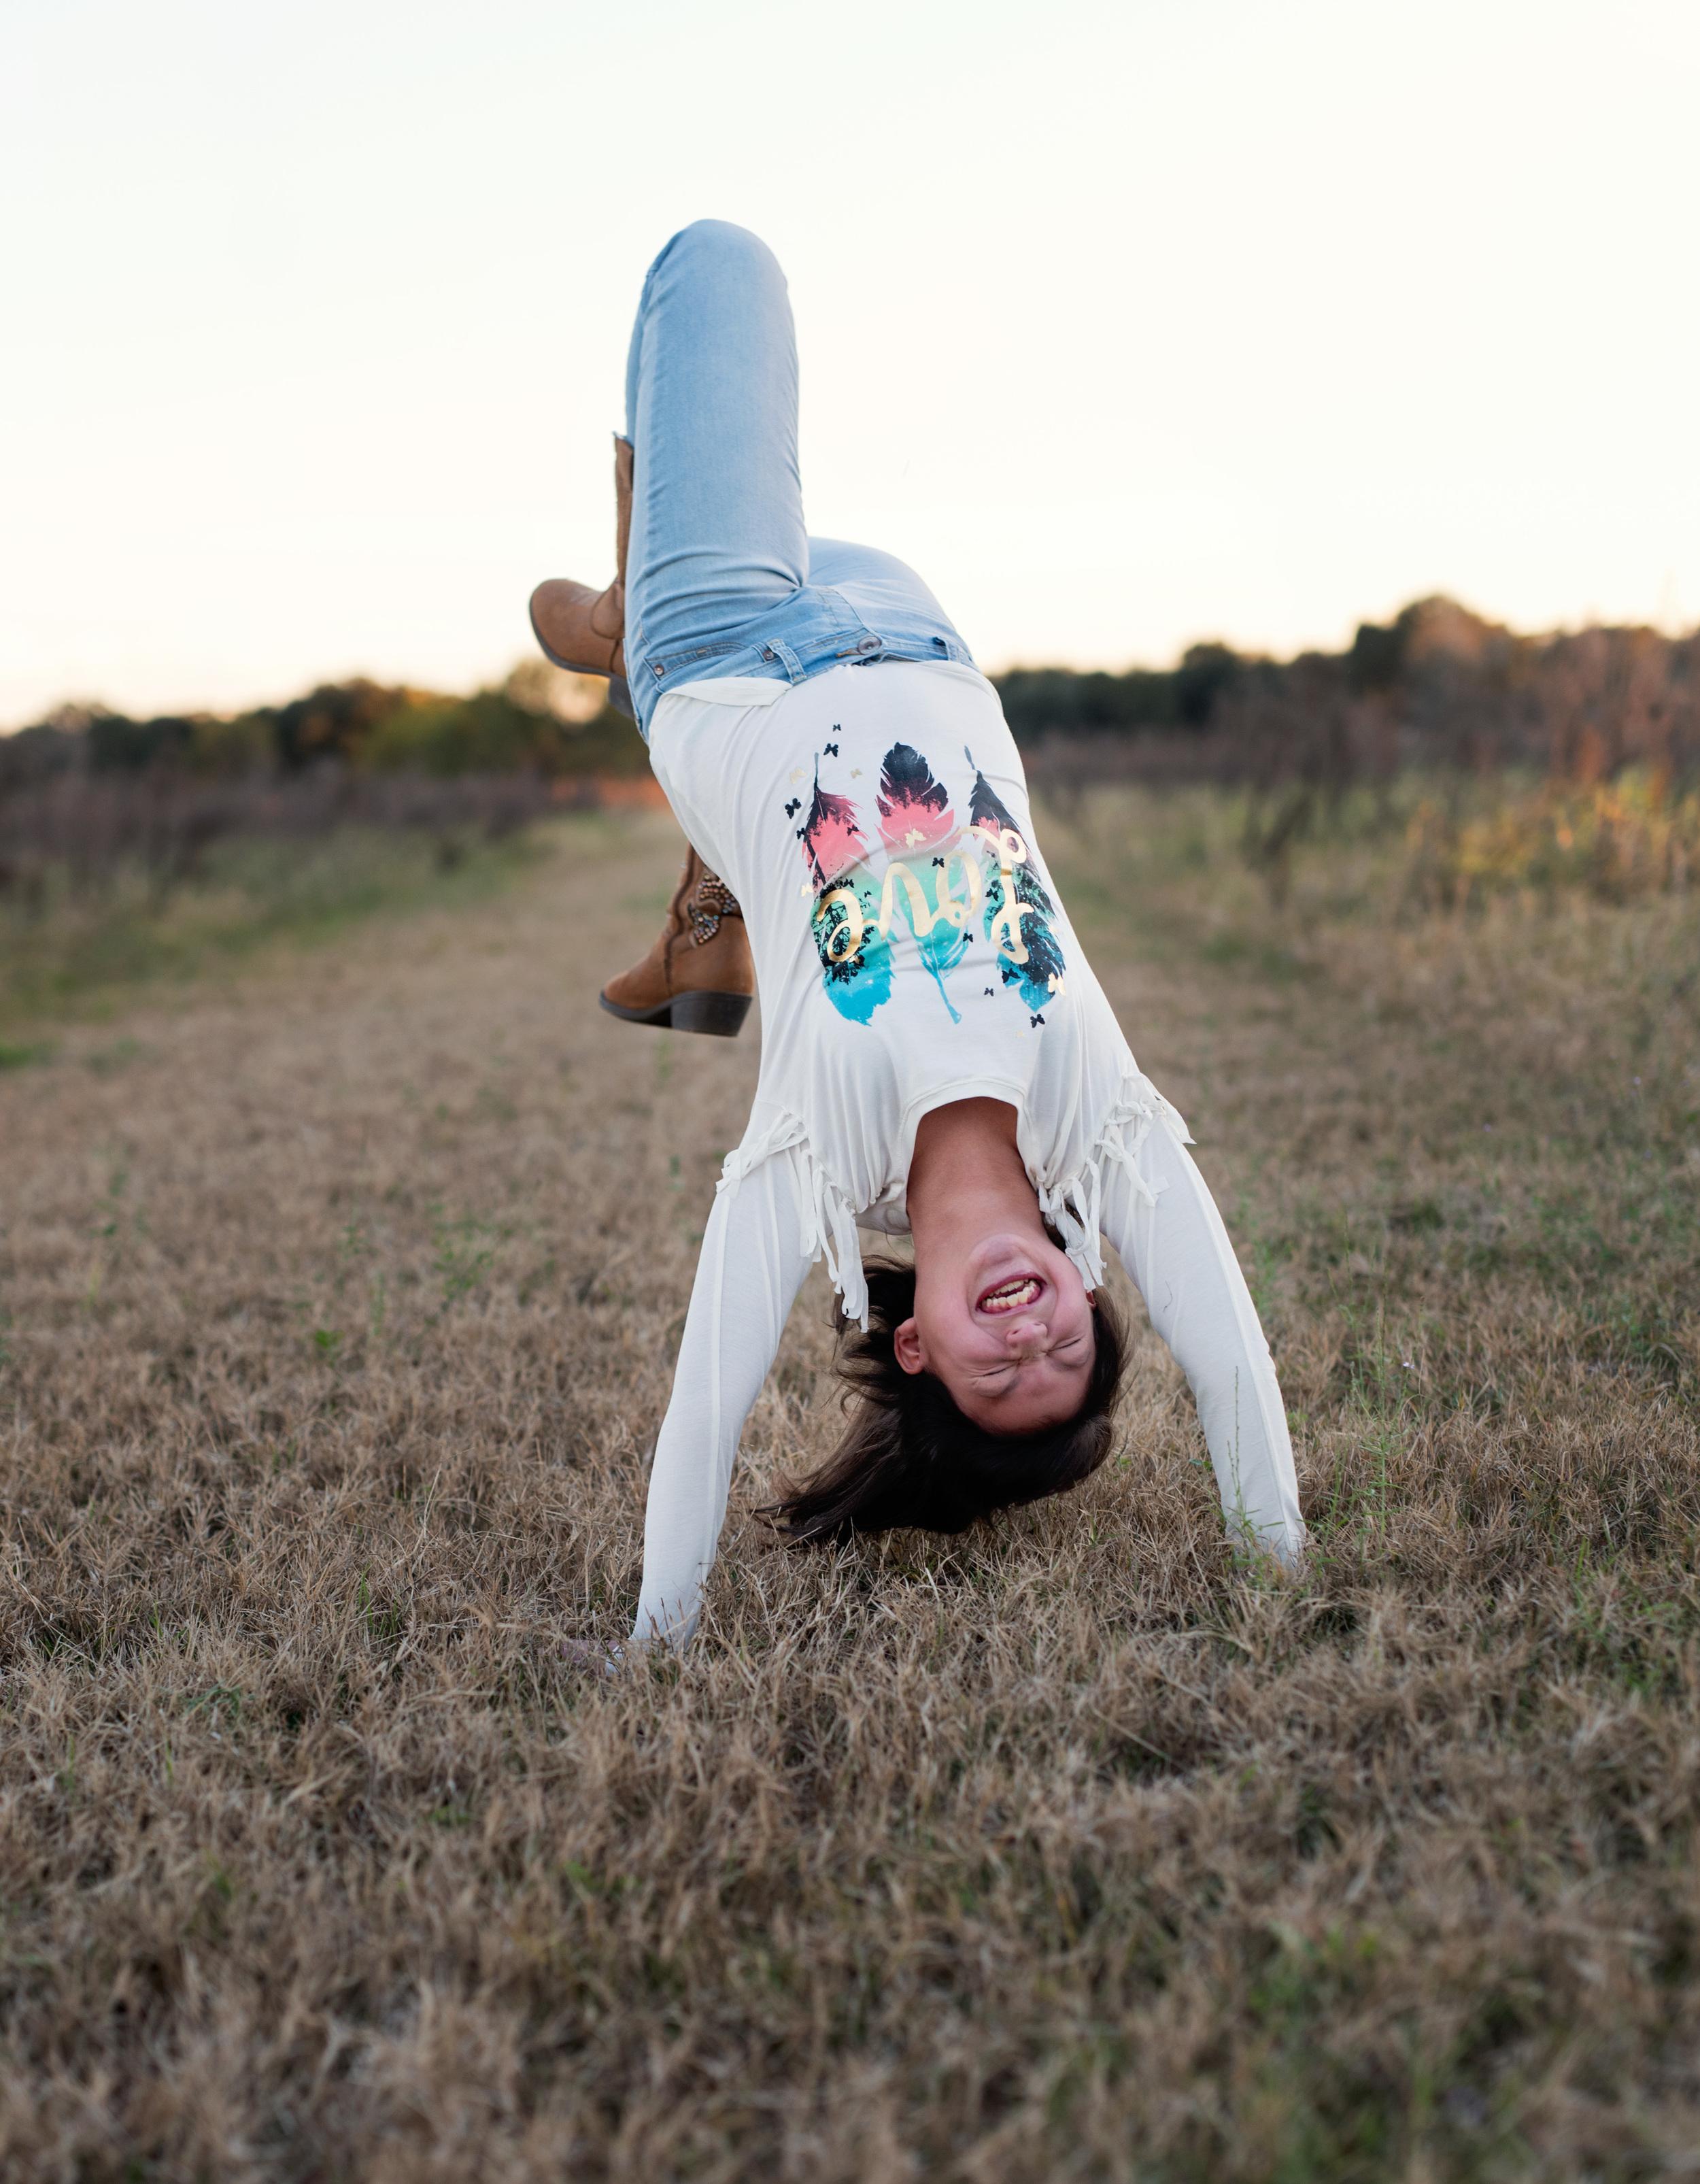 12 year old photos portraits, fun gymnastics